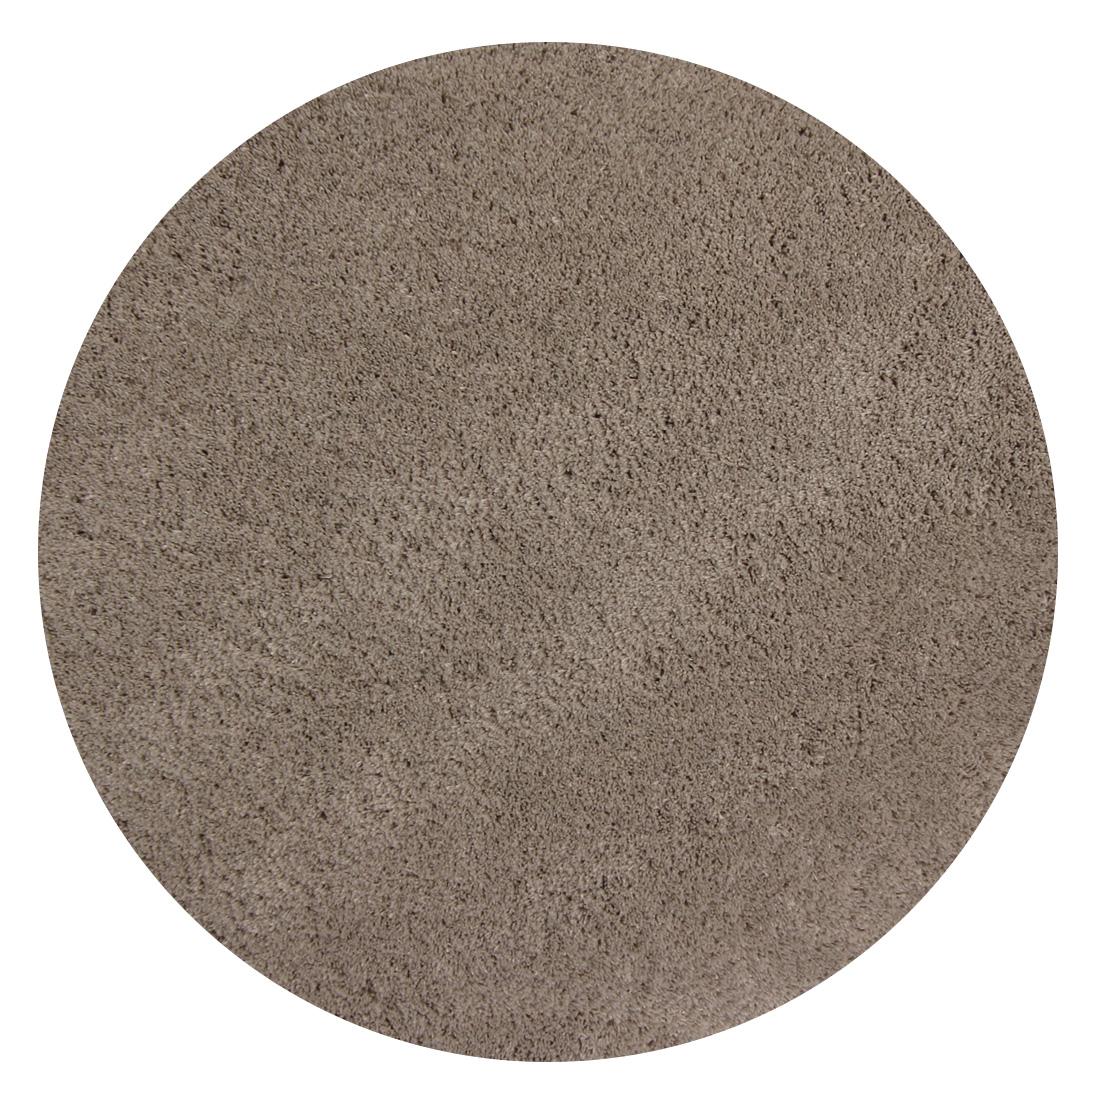 Rond Vloerkleed Xilento Silky Soft Stone